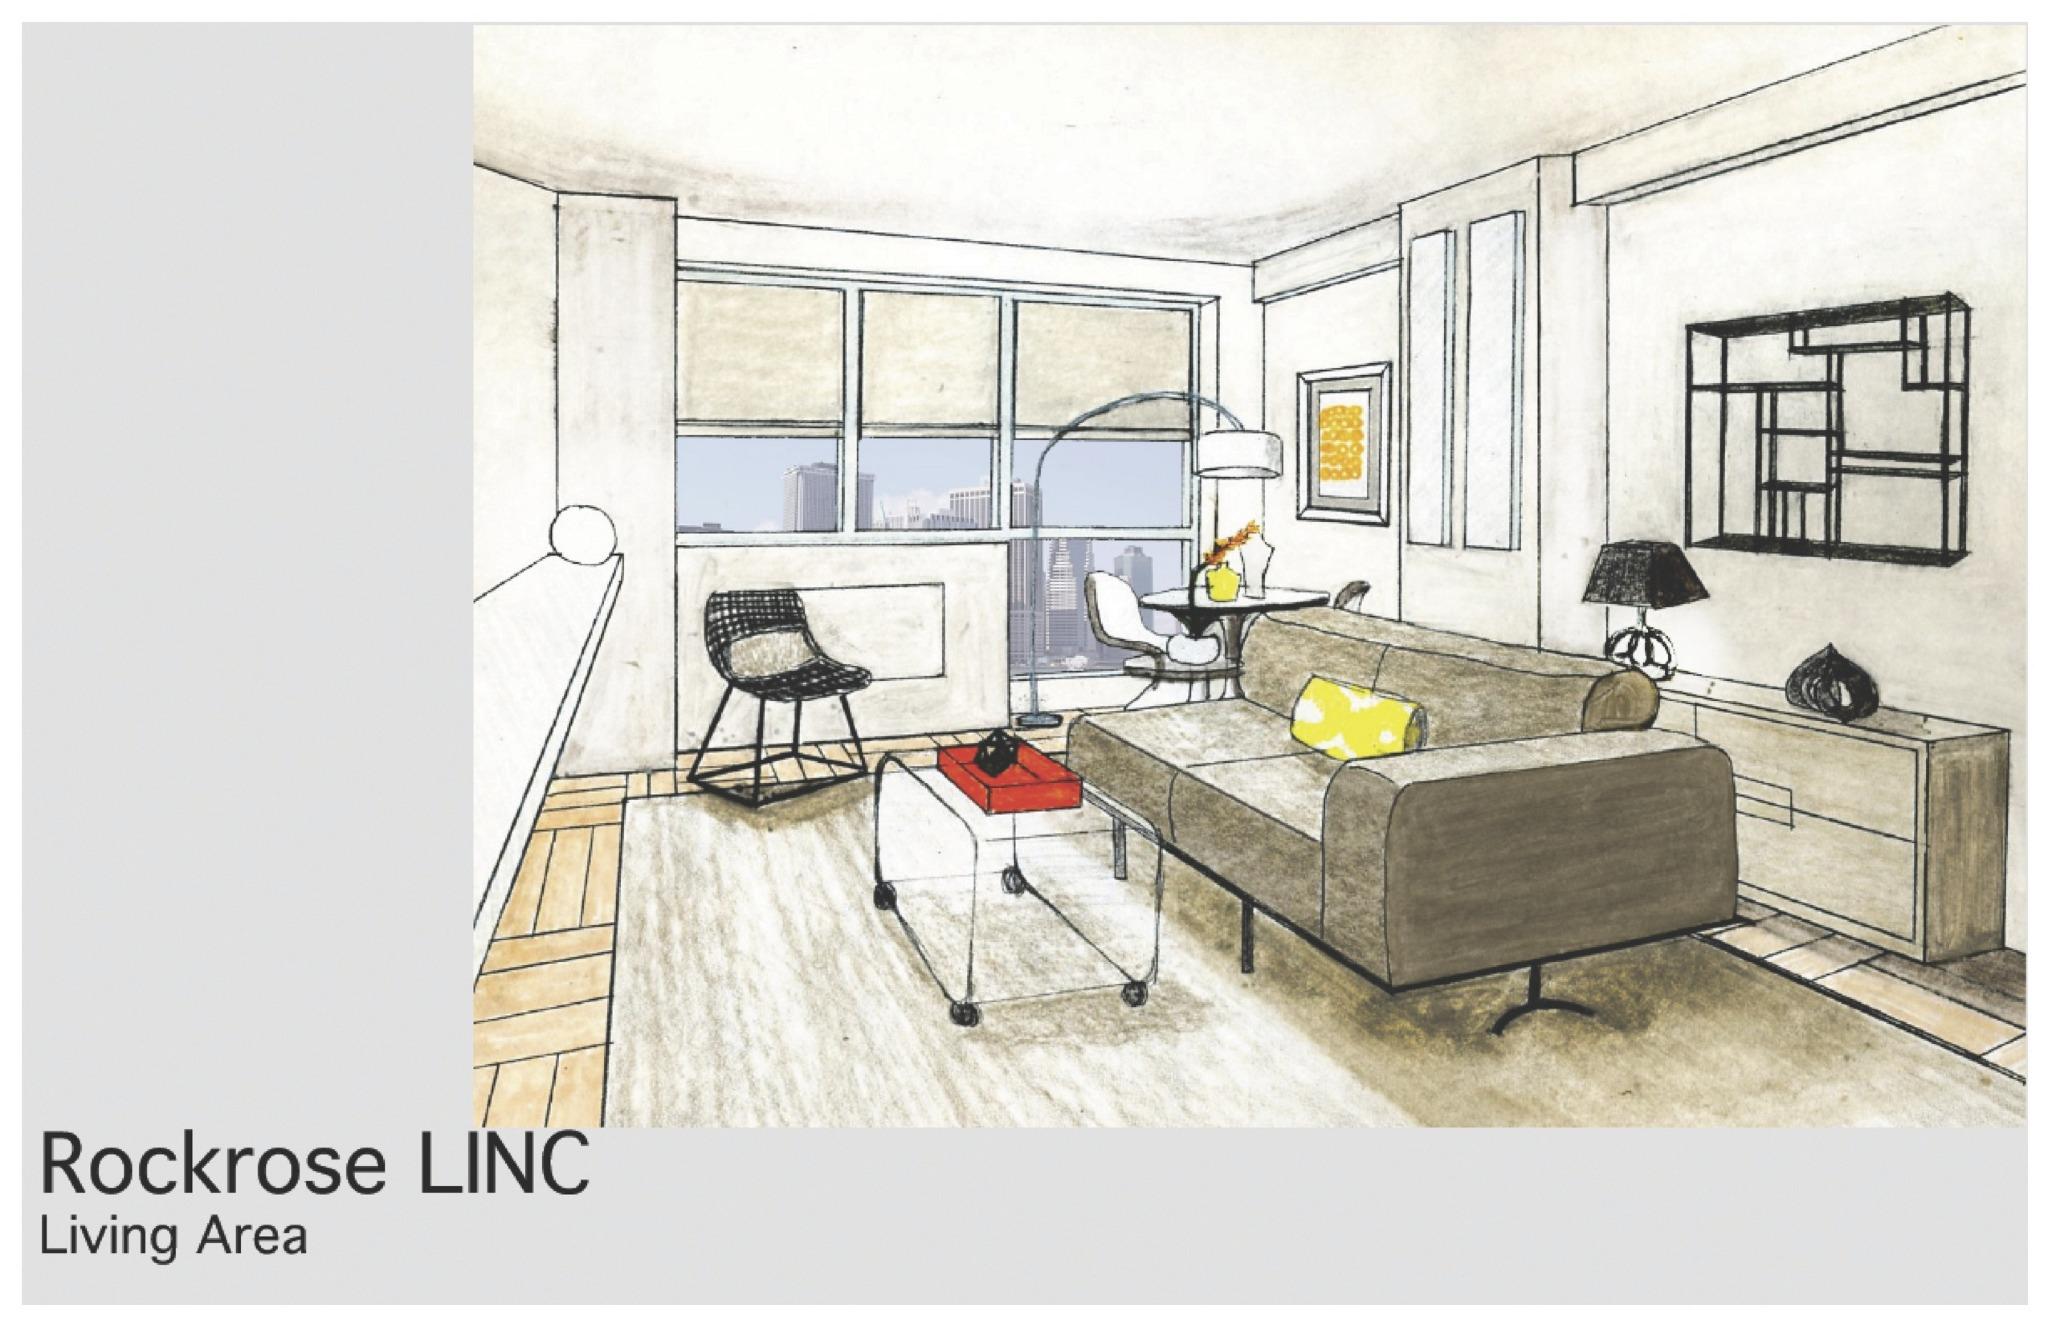 LIC Linc Rockrose Apartment - Amanda Rae Interiors